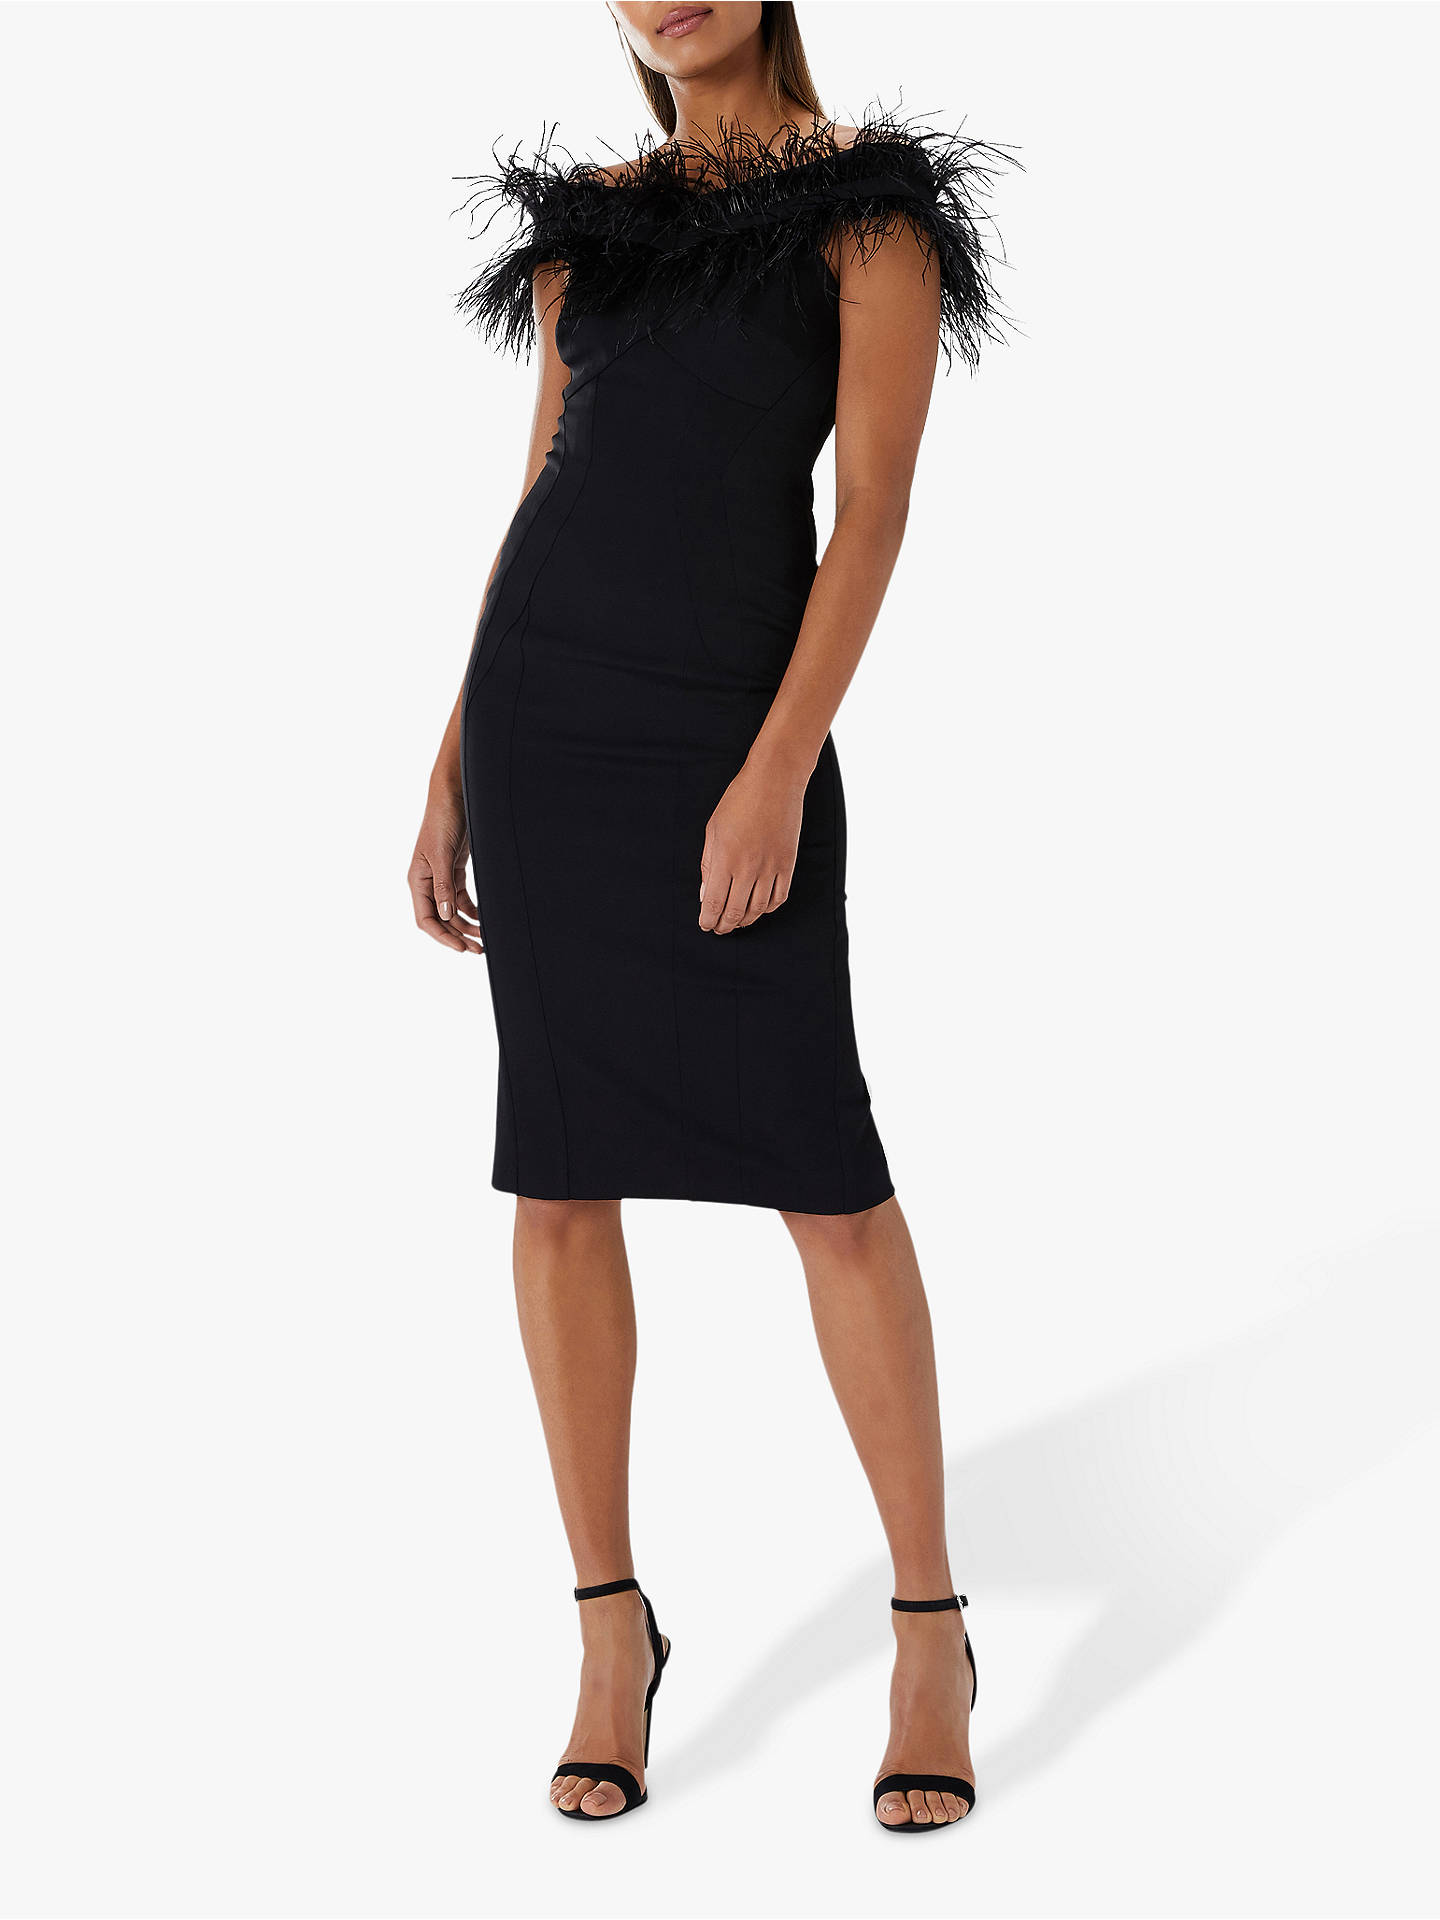 8c35b9e8bcbe6 Coast Holly Feather Cocktail Dress, Black at John Lewis & Partners